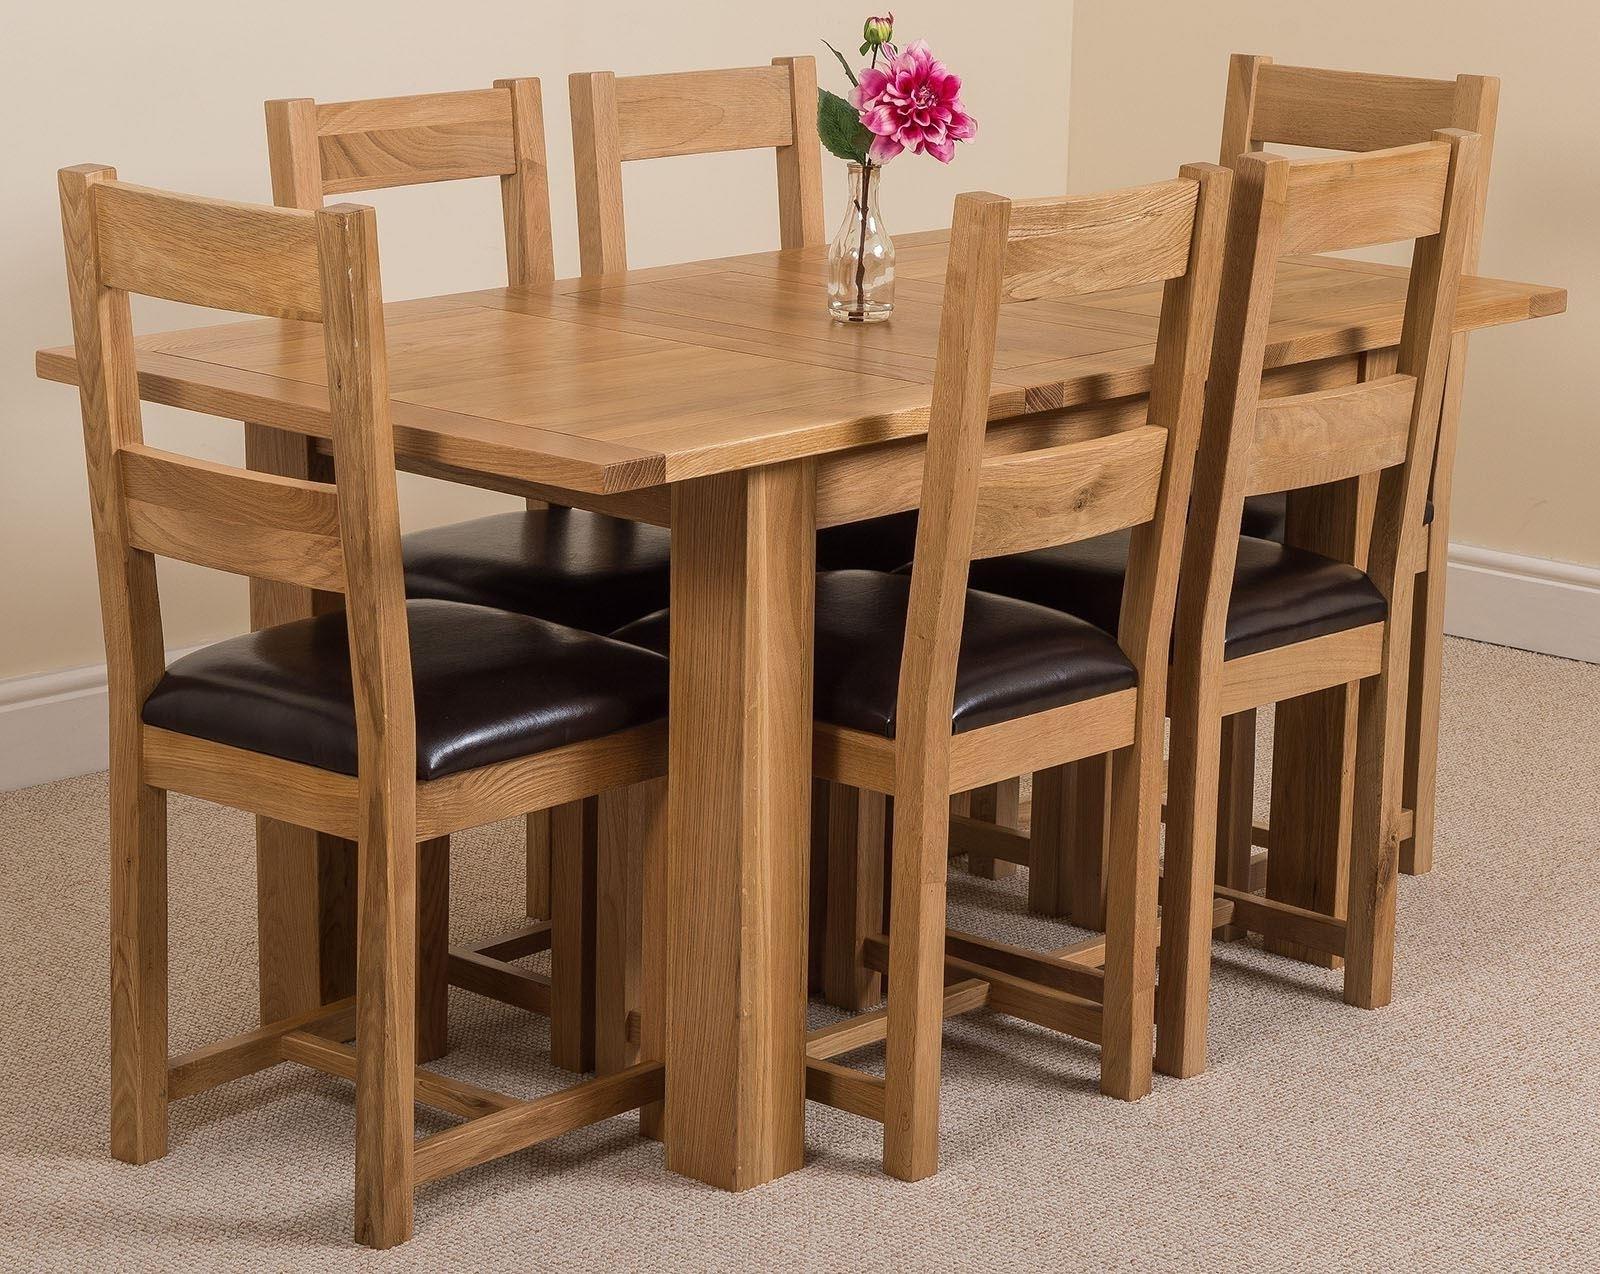 Oak Furniture King (View 16 of 25)